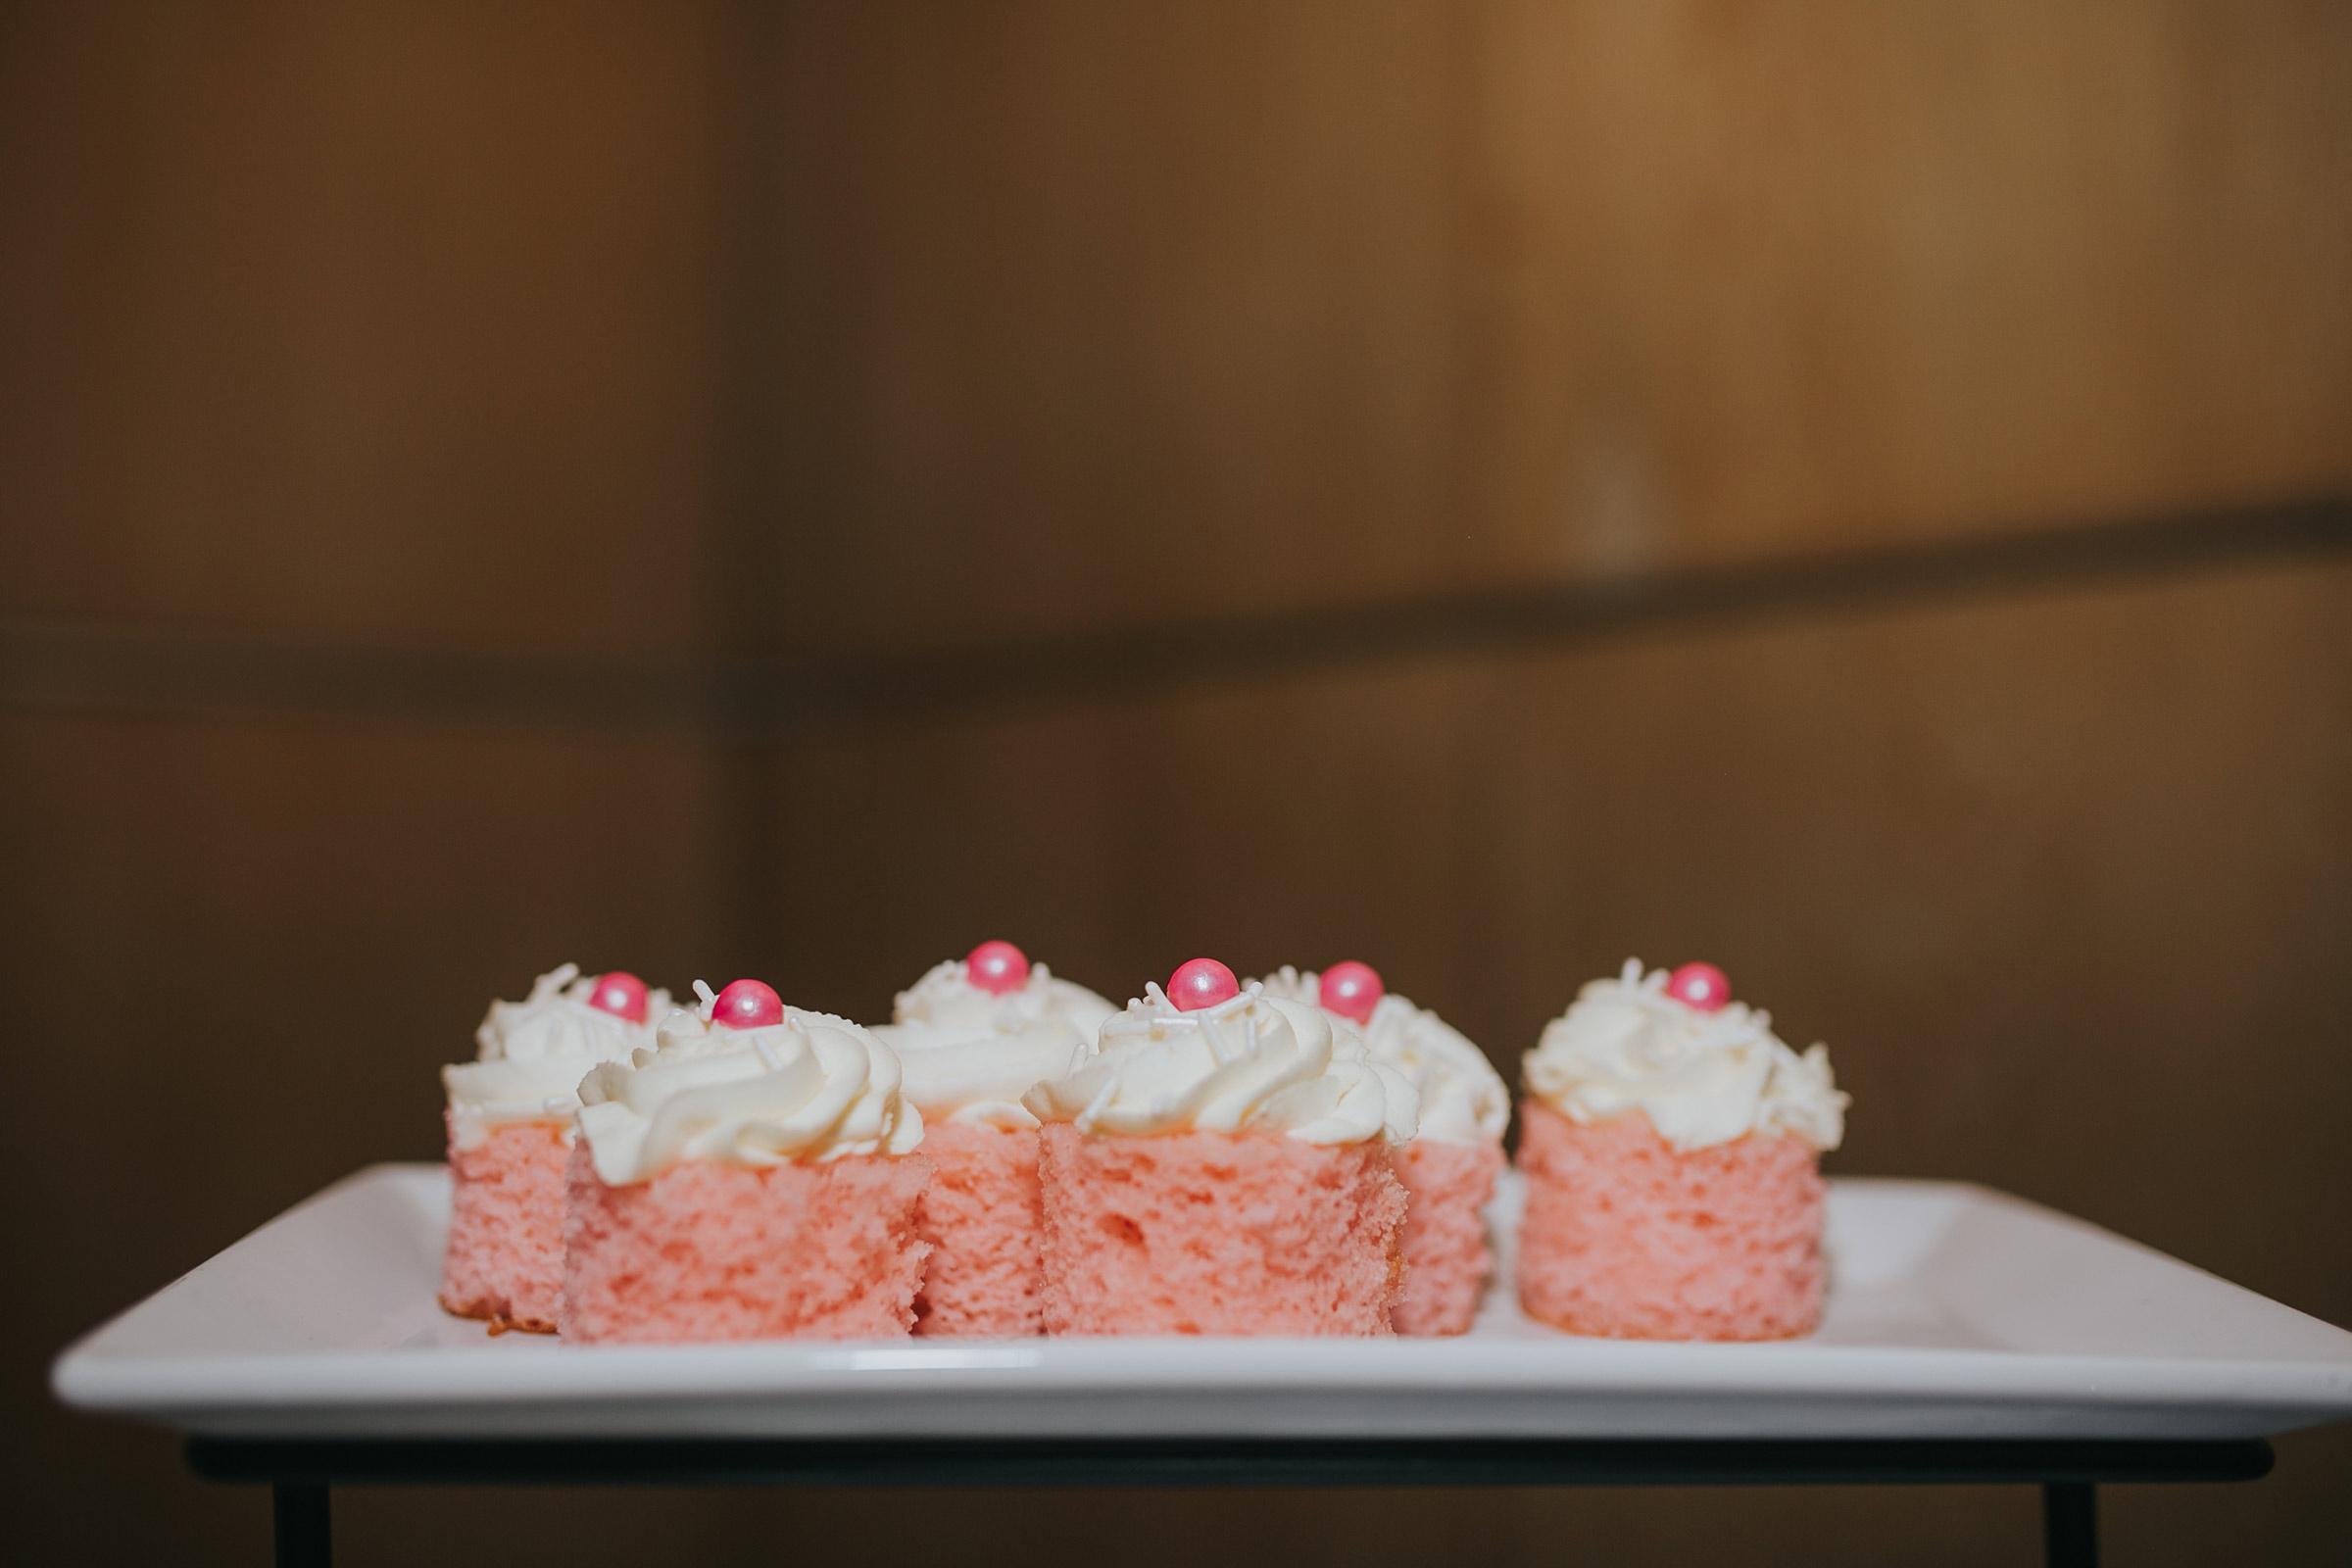 strawberry-cupcake-display-art-center-raelyn-ramey-photography.jpg